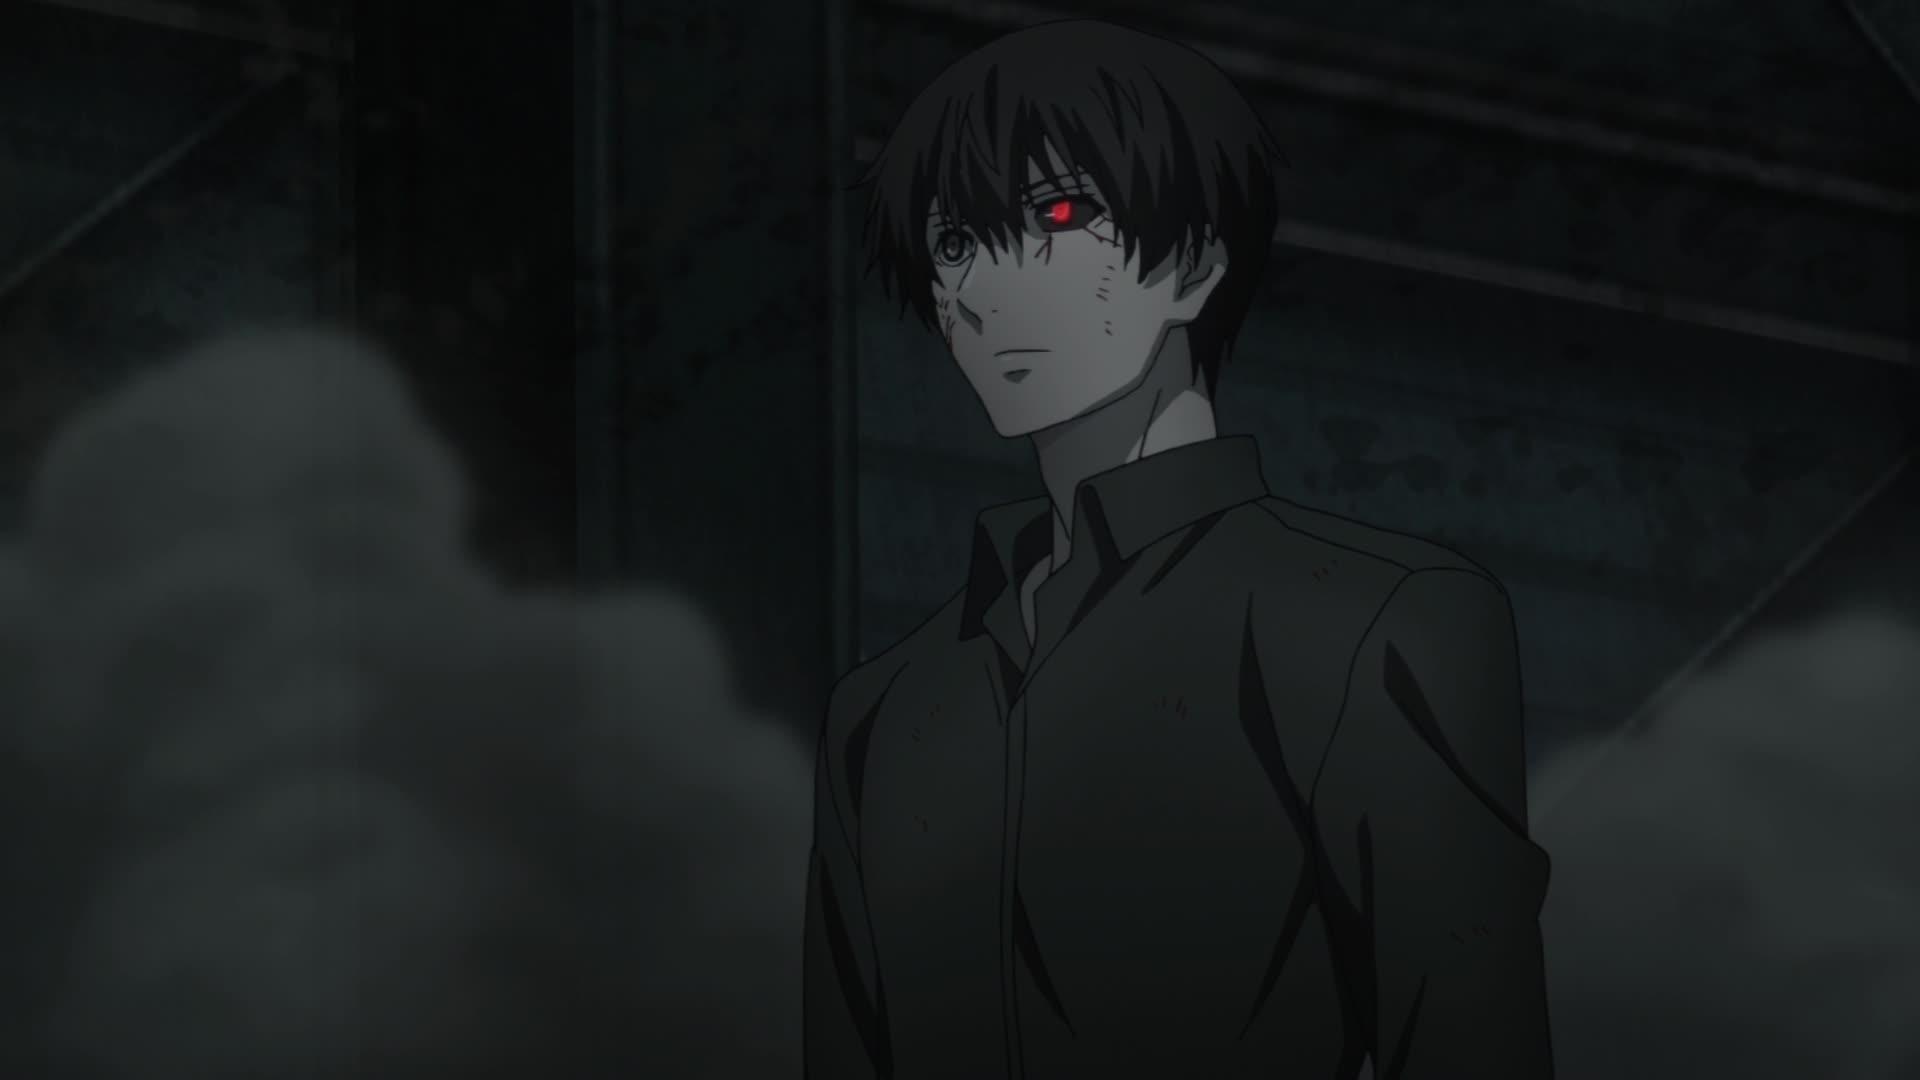 Tokyo Ghoul: re Episode 12, Dawn, - Watch on Crunchyroll